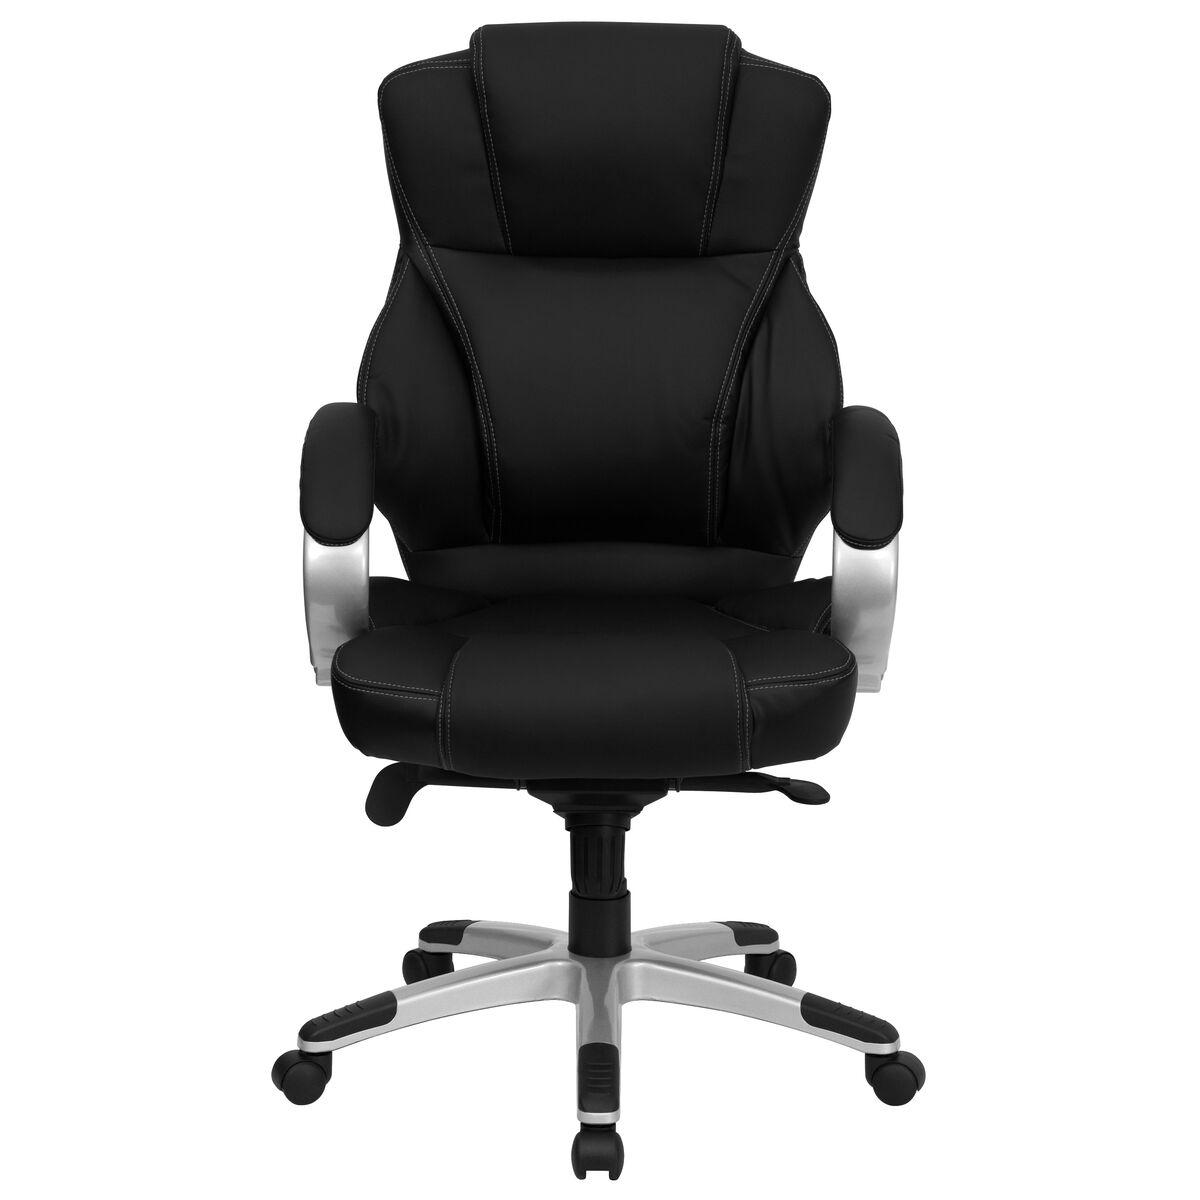 Flash furniture h 9626l 2 gg for H furniture ww chair